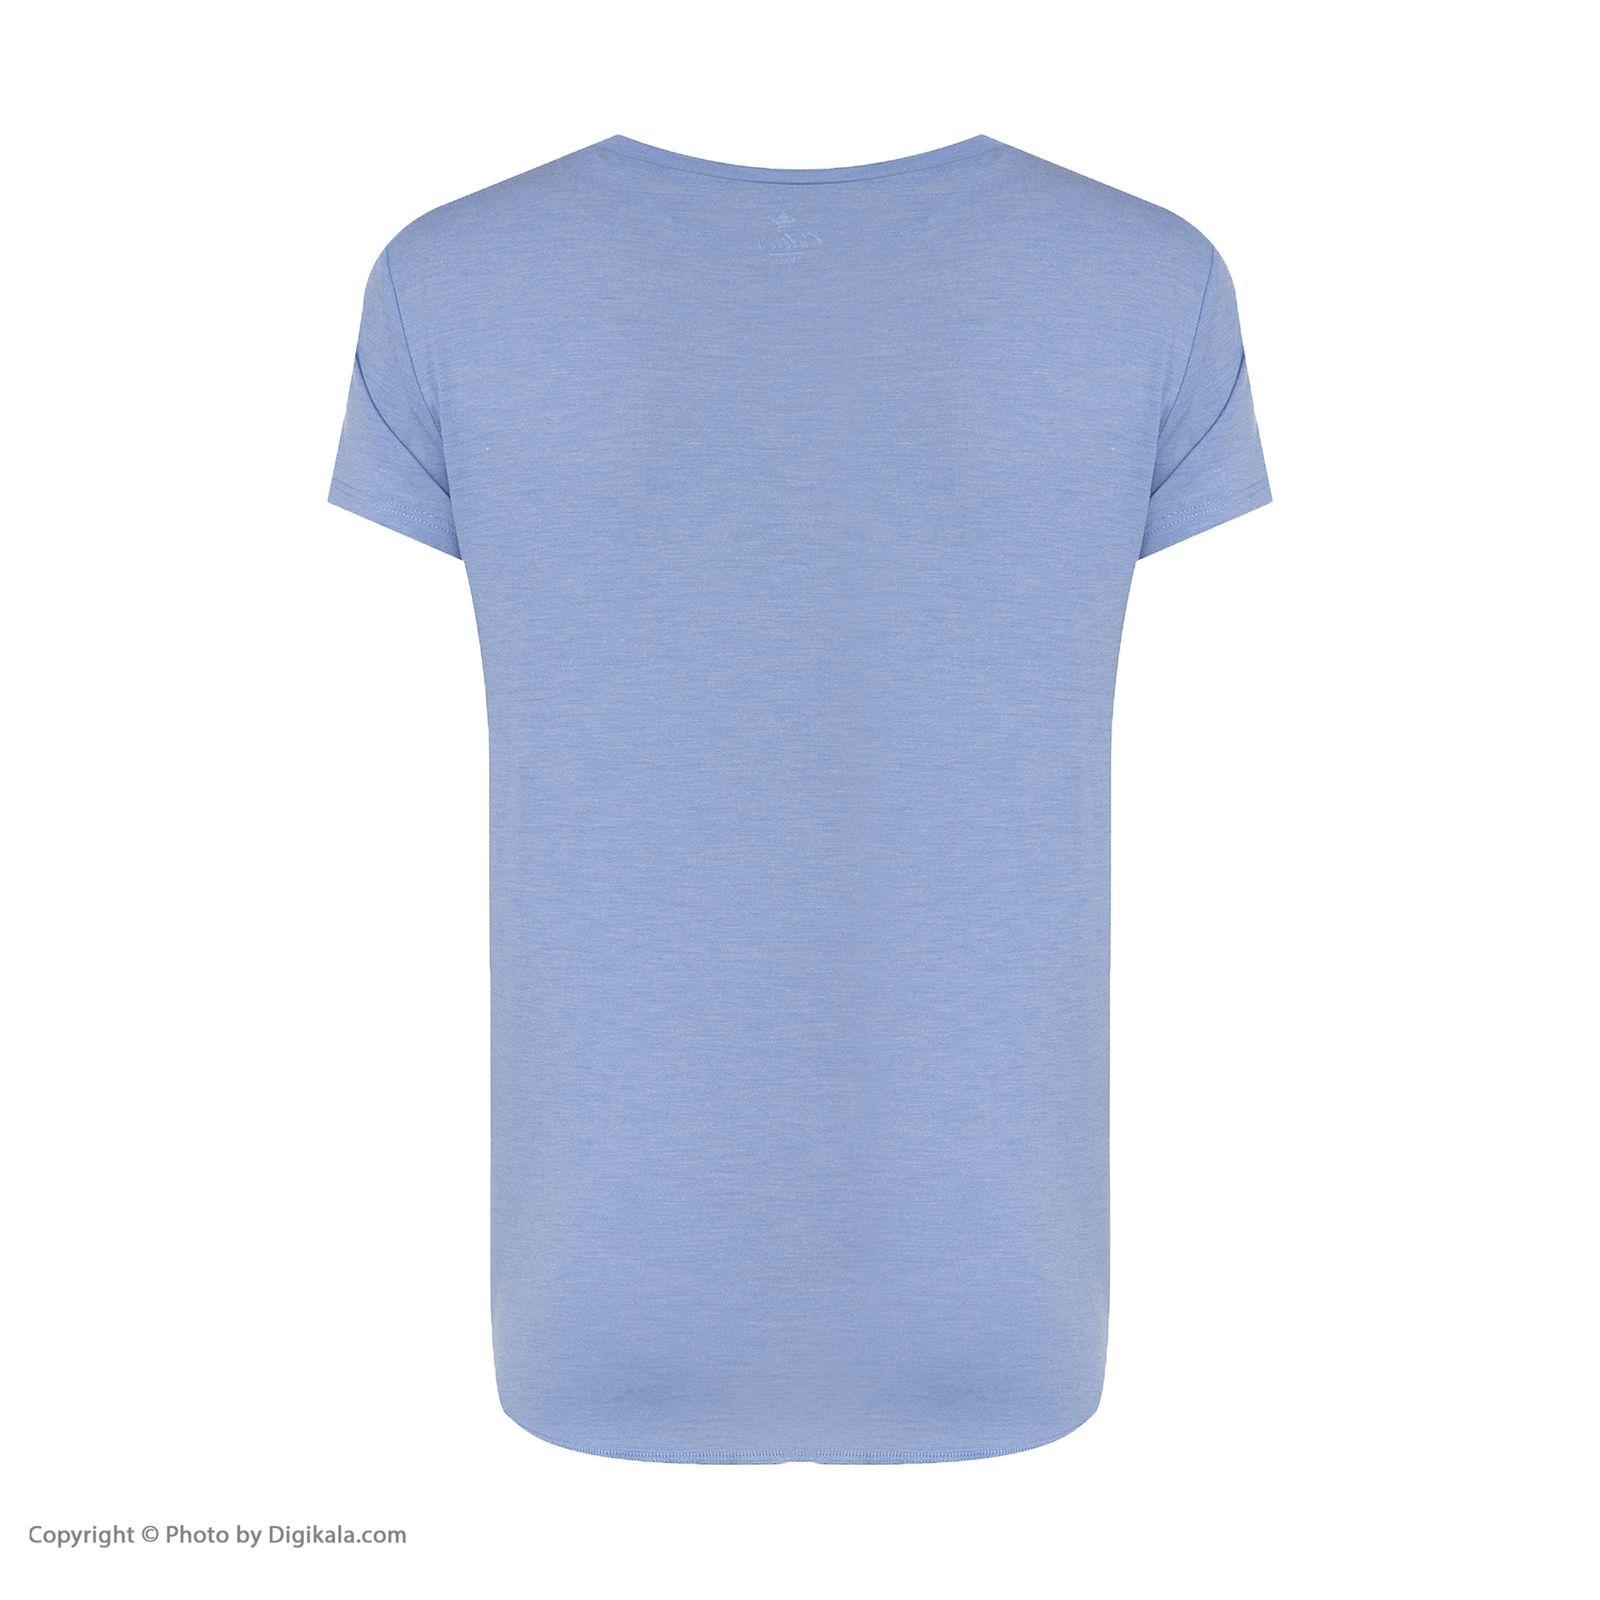 تی شرت زنانه کالینز مدل CL1026819-BLUEMELANGE main 1 3